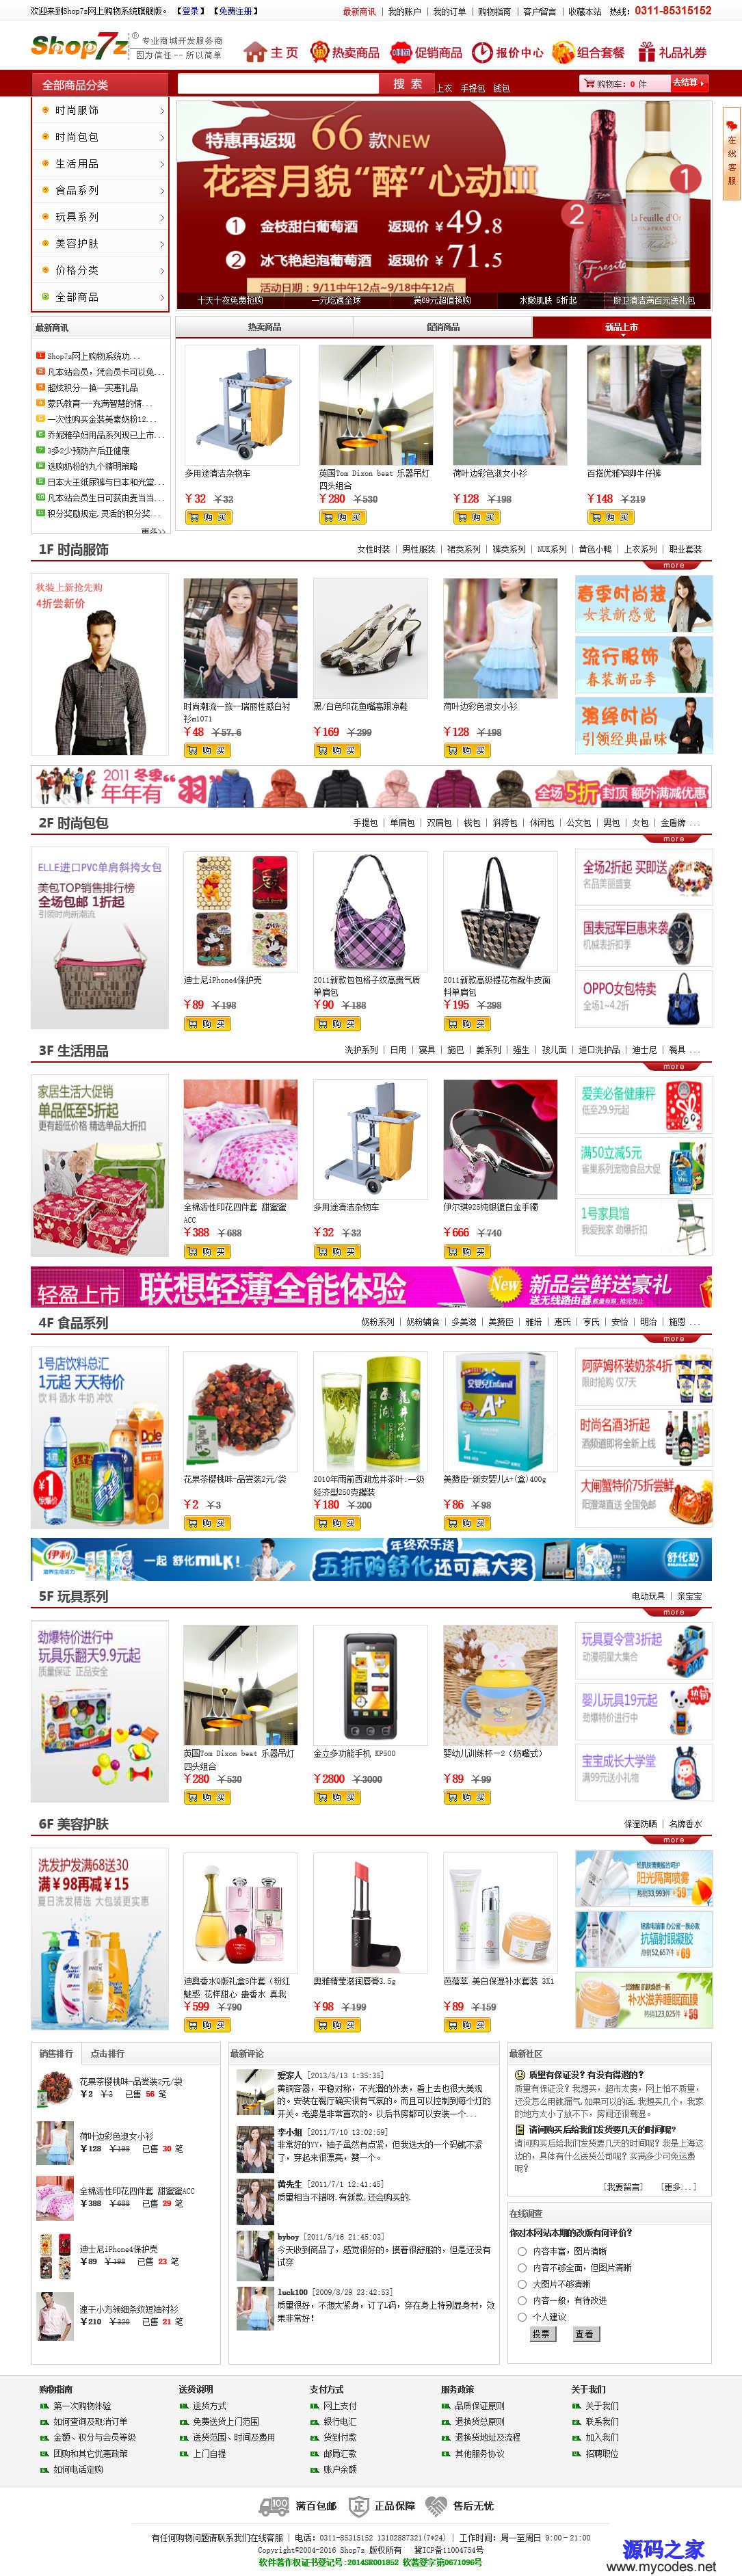 Shop7z网上购物系统旗舰版 3.0